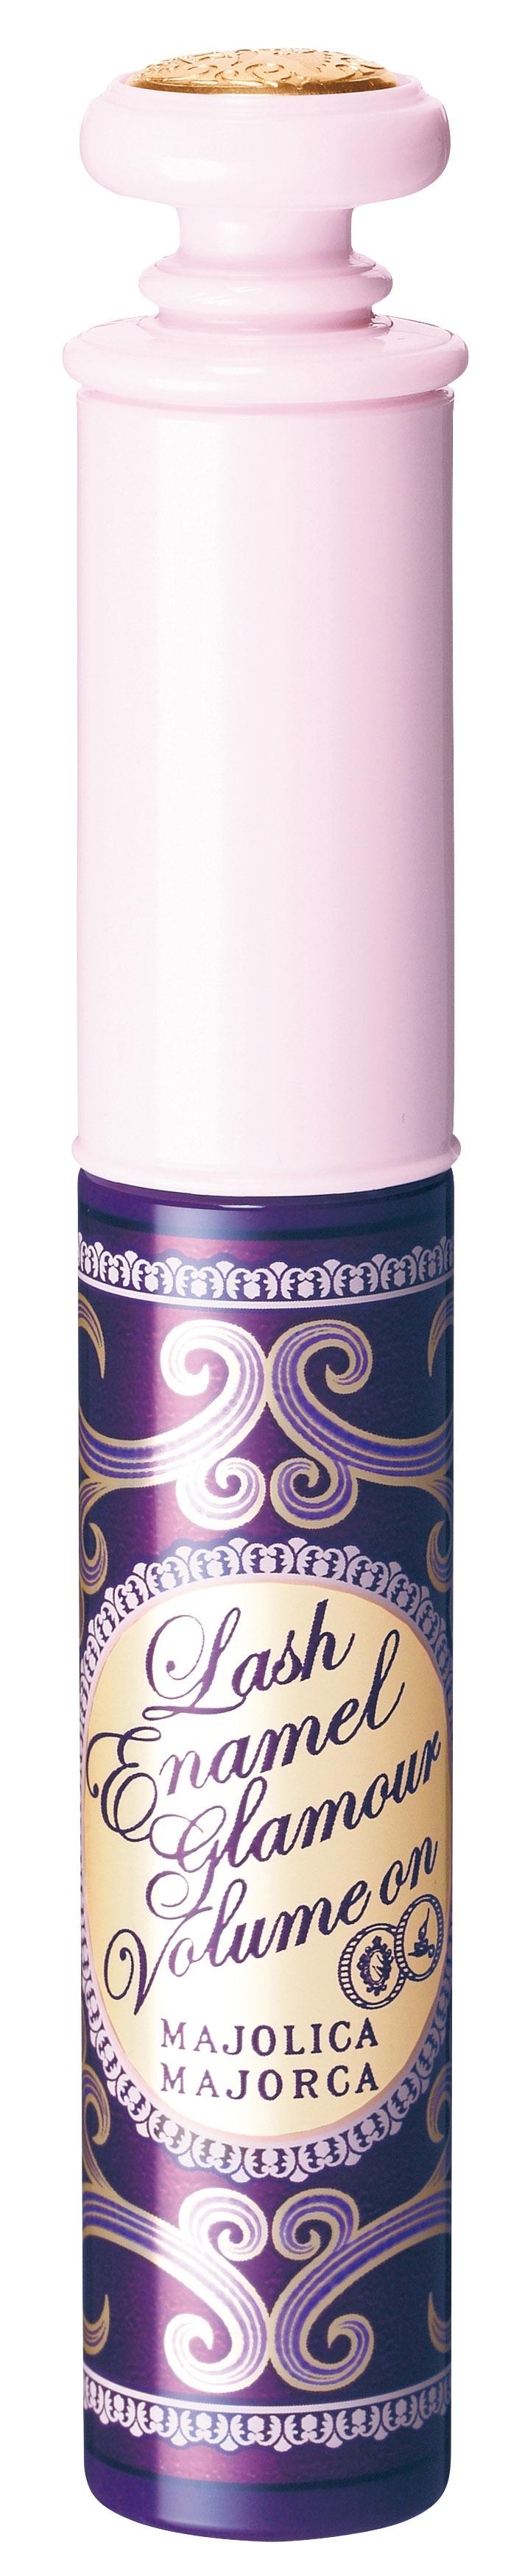 MJ 2010年5月魅惑光感睫毛膏第三代 VI606紫色魔法 500K.jpg